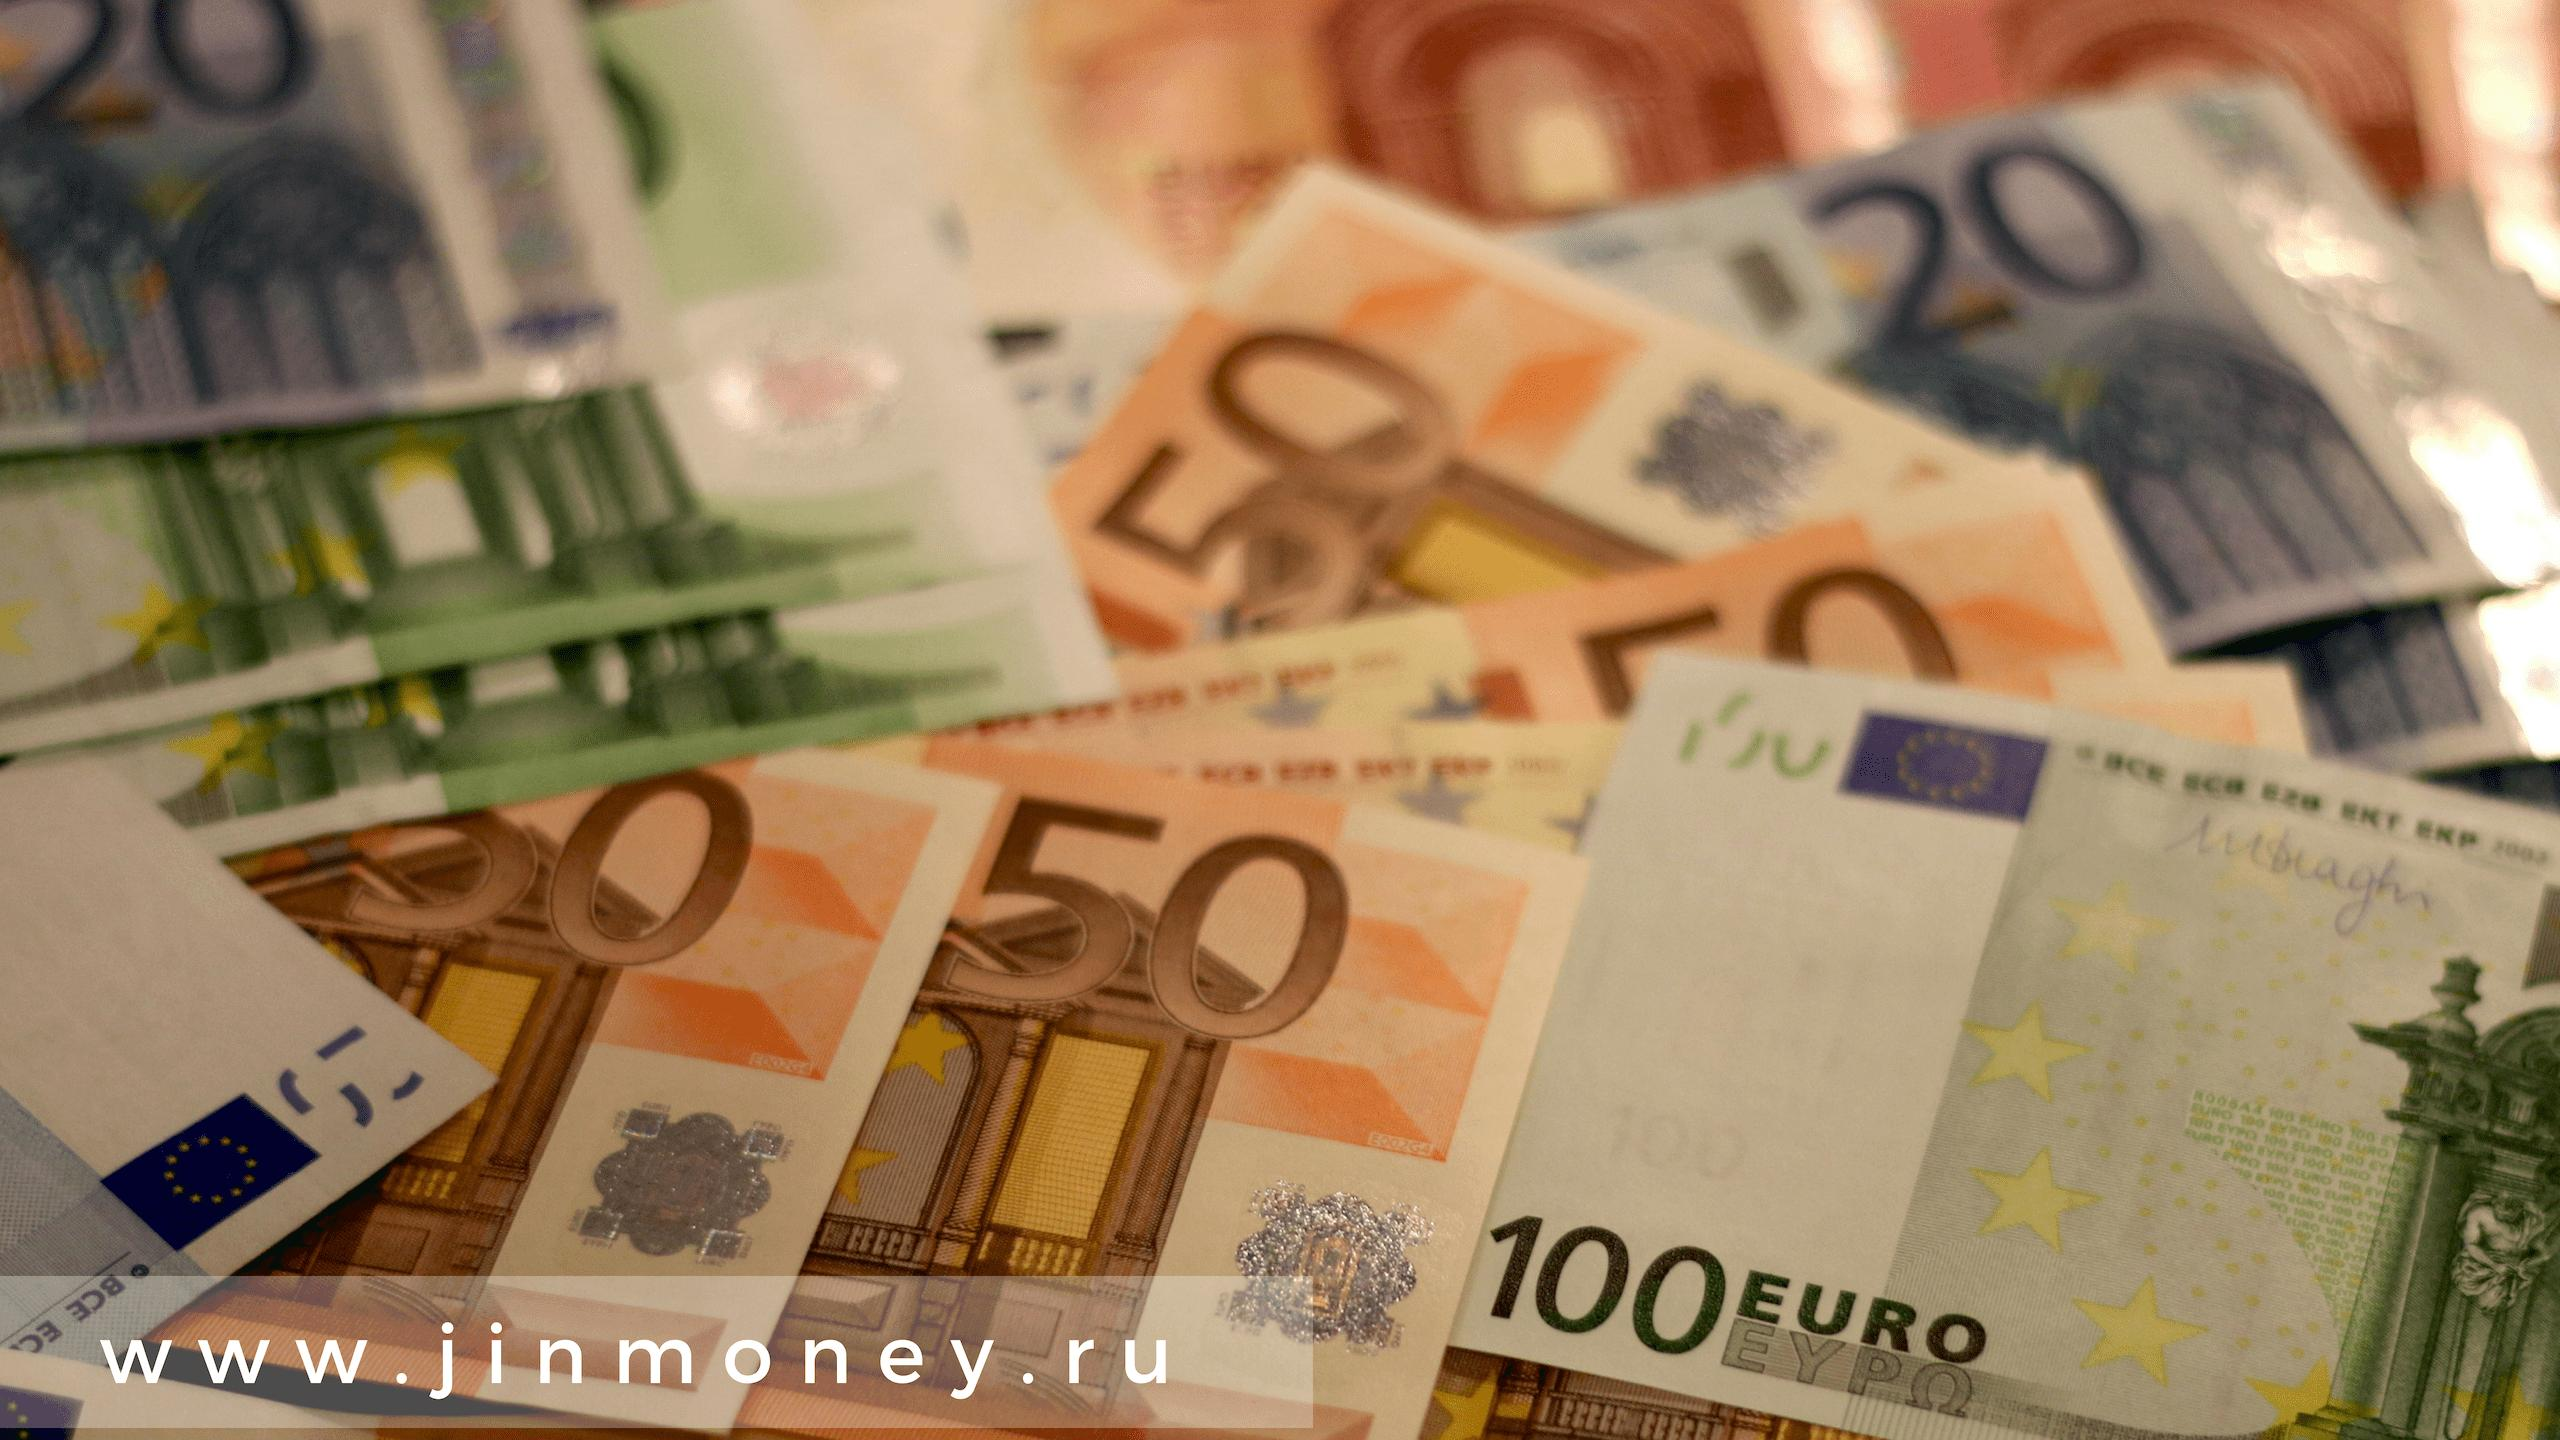 через амнистию капиталов за 2018 год прошло более 10 млрд евро